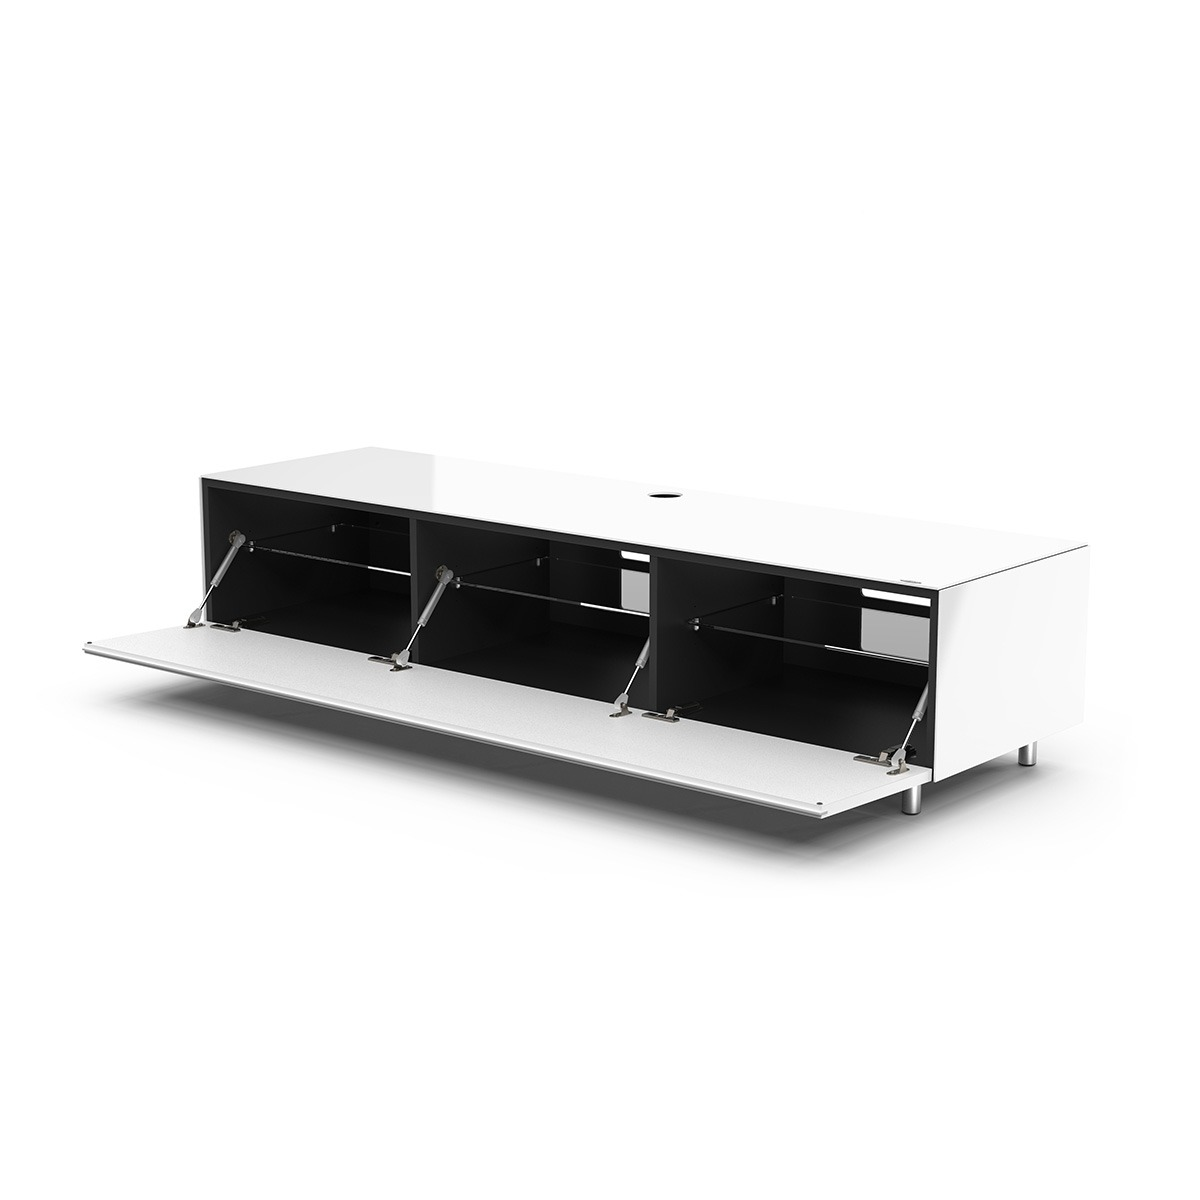 Afbeelding van Just Racks JRL1650T-SL SNG TV meubel